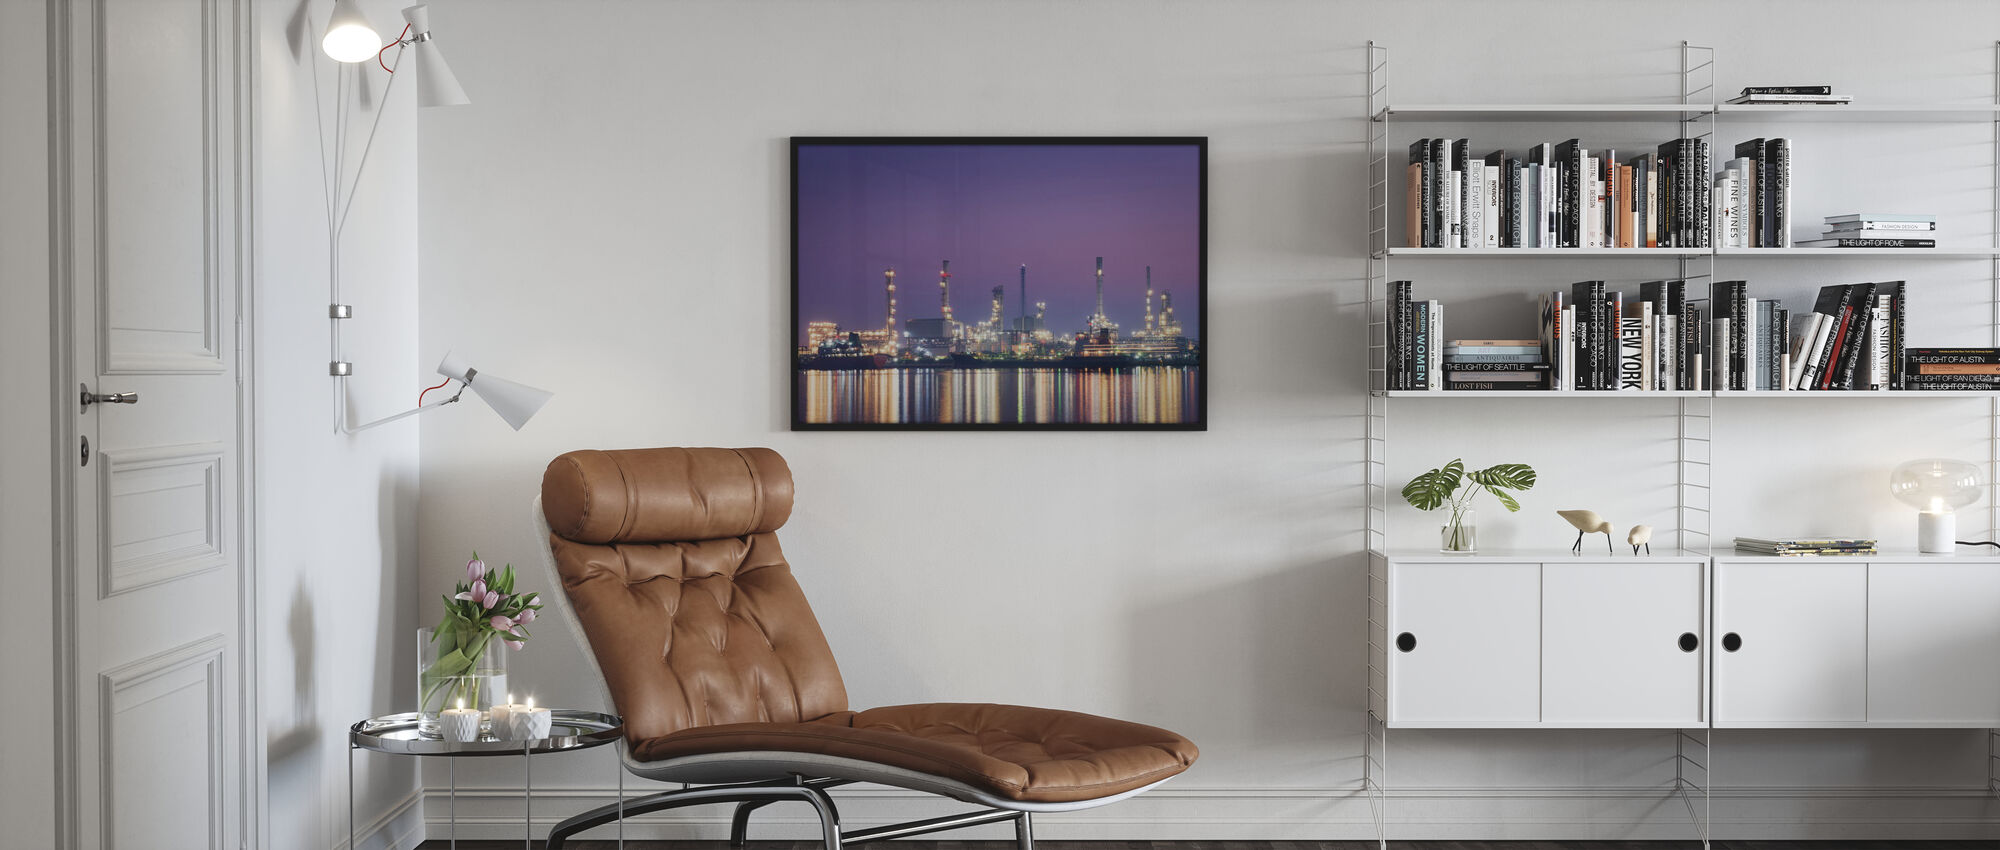 Petroleum Morning - Poster - Living Room